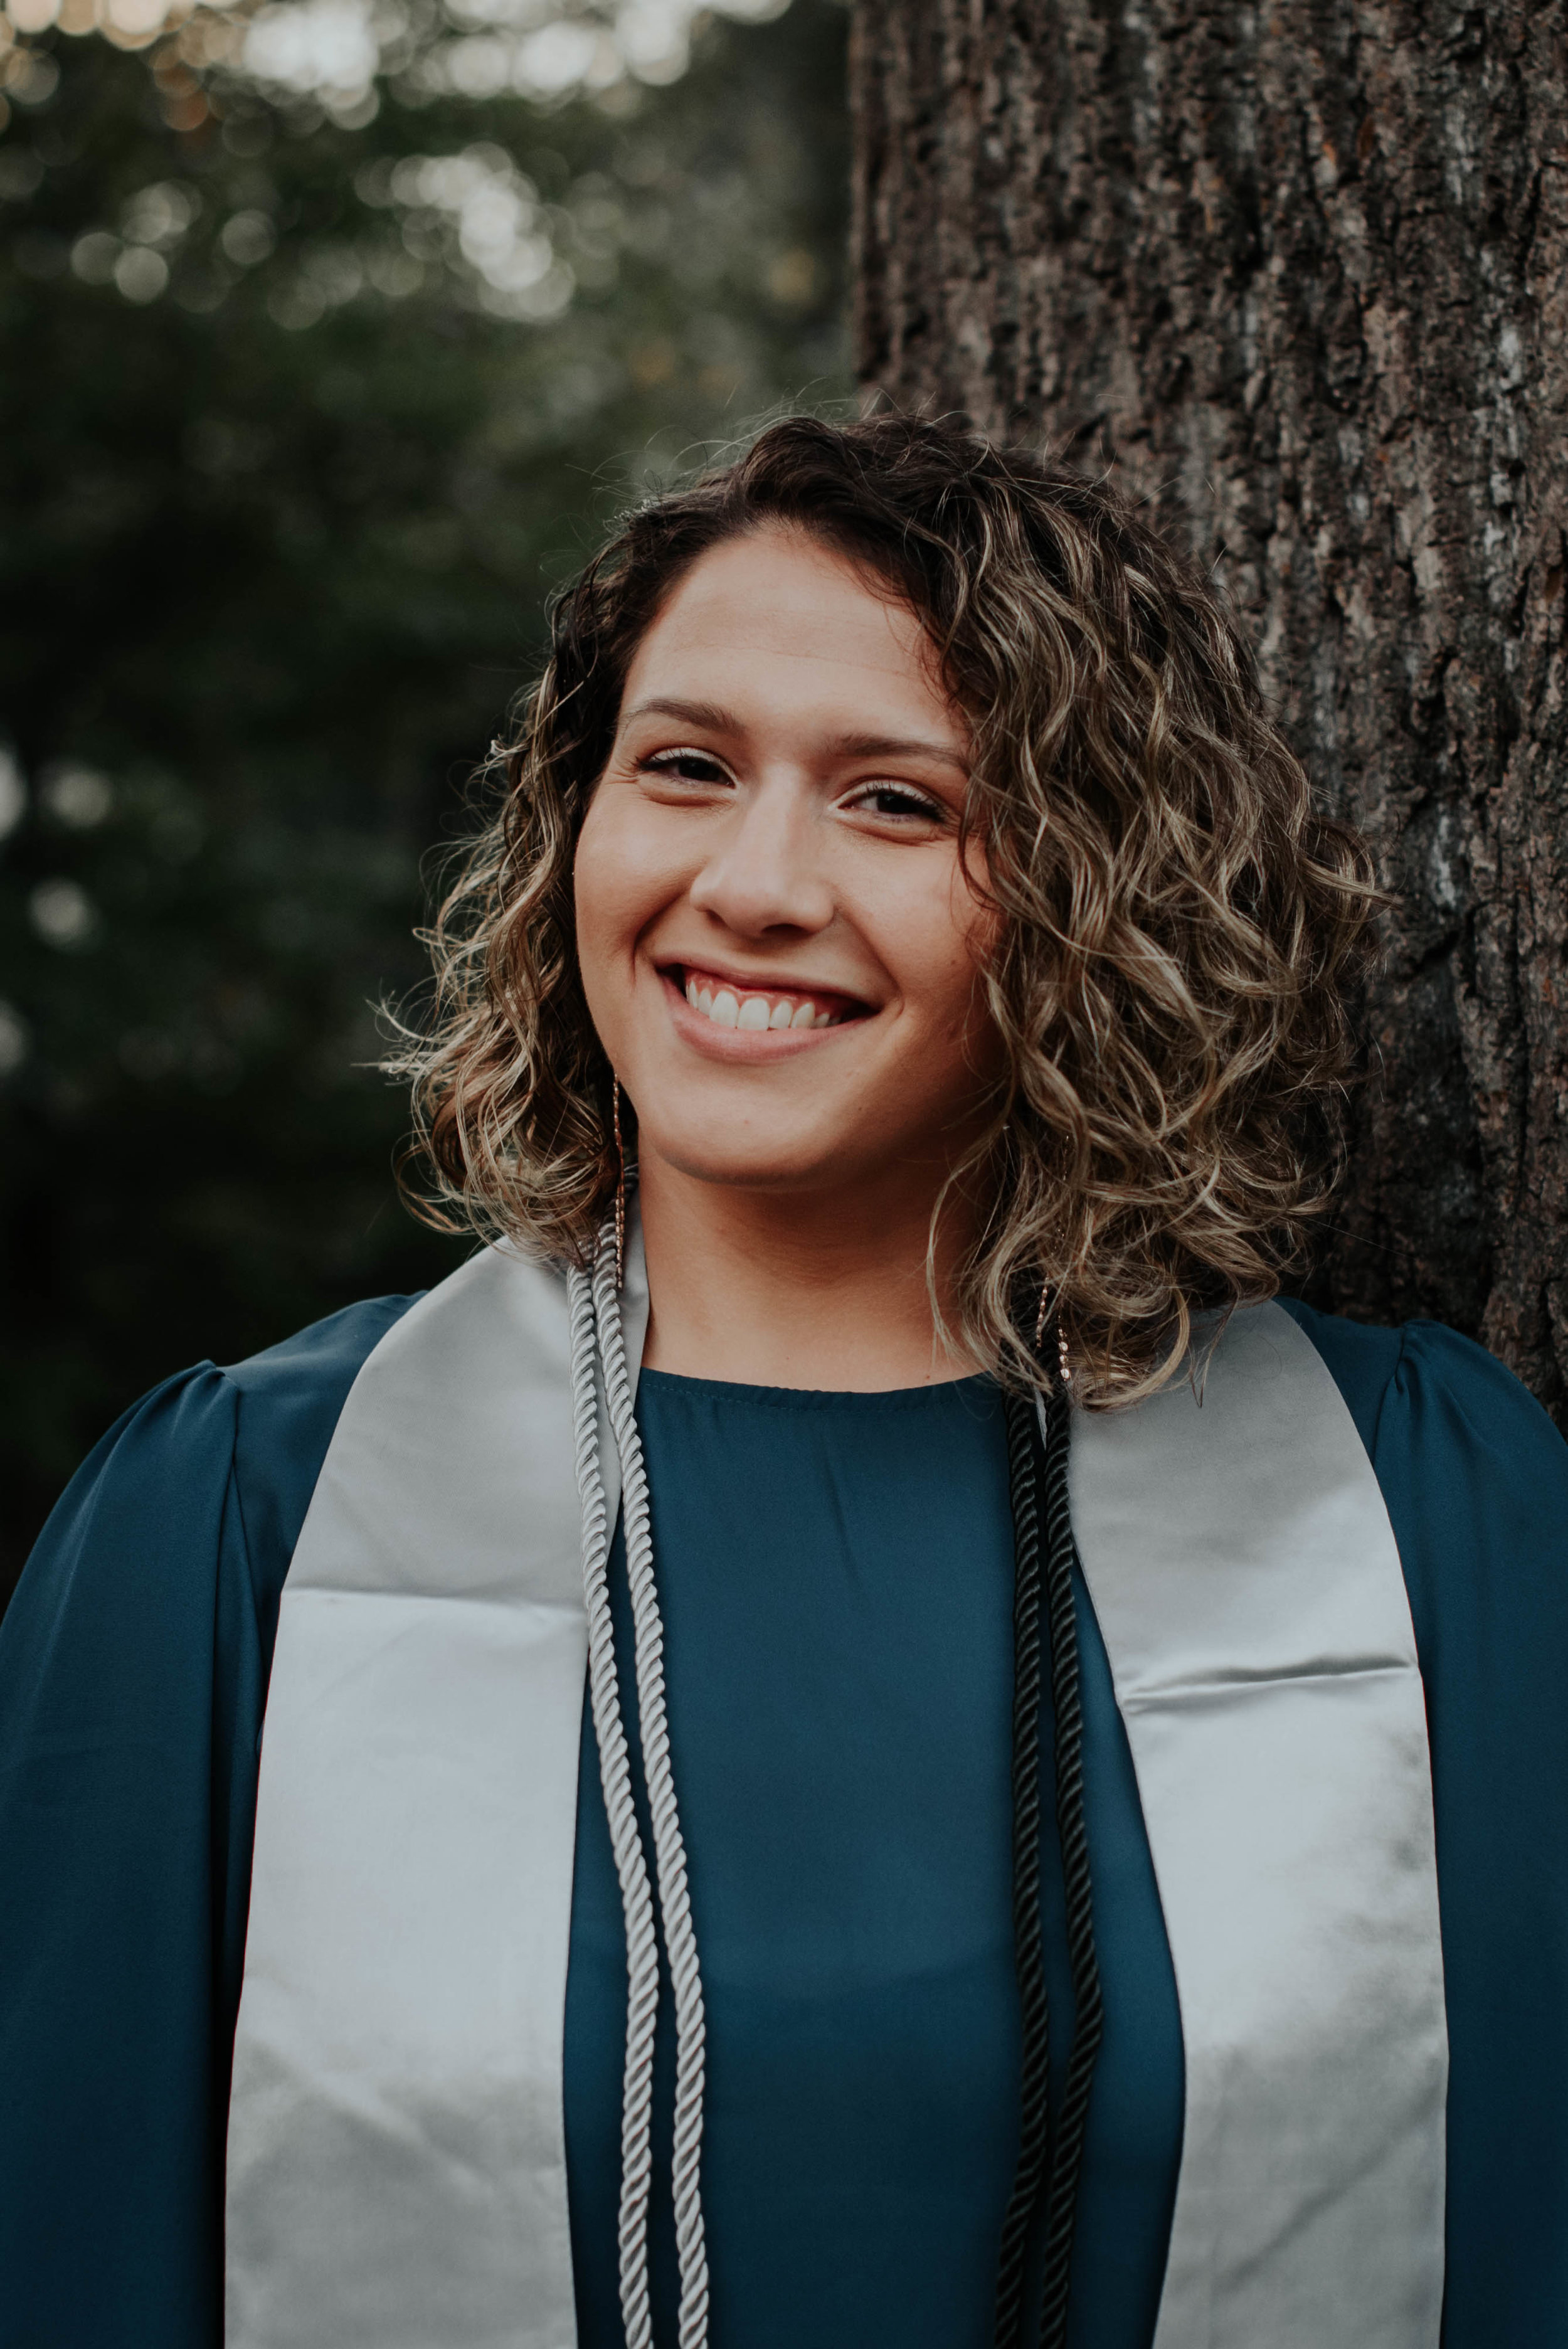 Erin-Kirkpatrick-Photography-Victoria-Graduation-Oct-2017-50.jpg